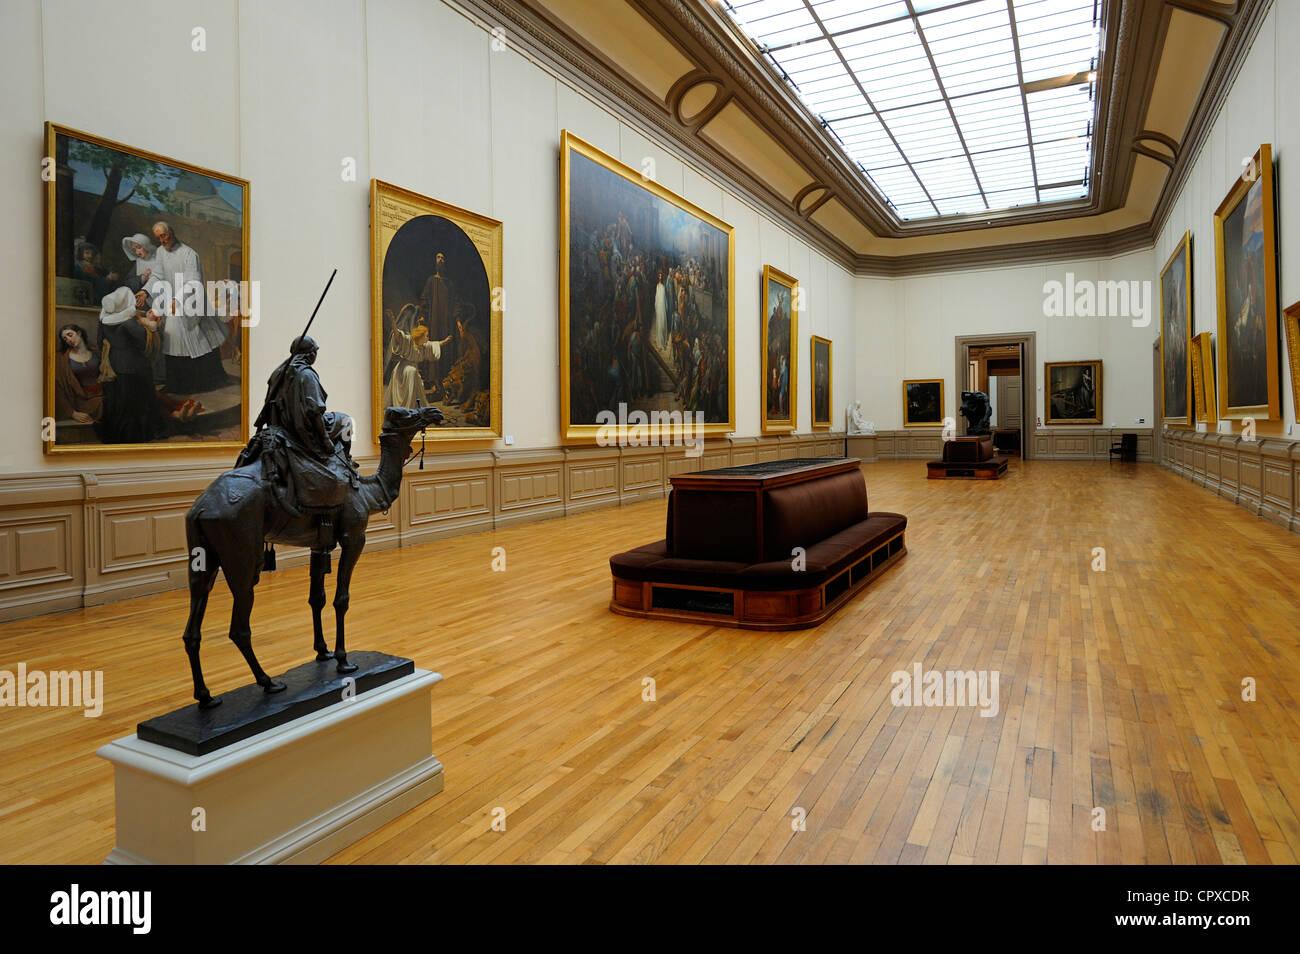 musee des beaux arts stock photos musee des beaux arts. Black Bedroom Furniture Sets. Home Design Ideas